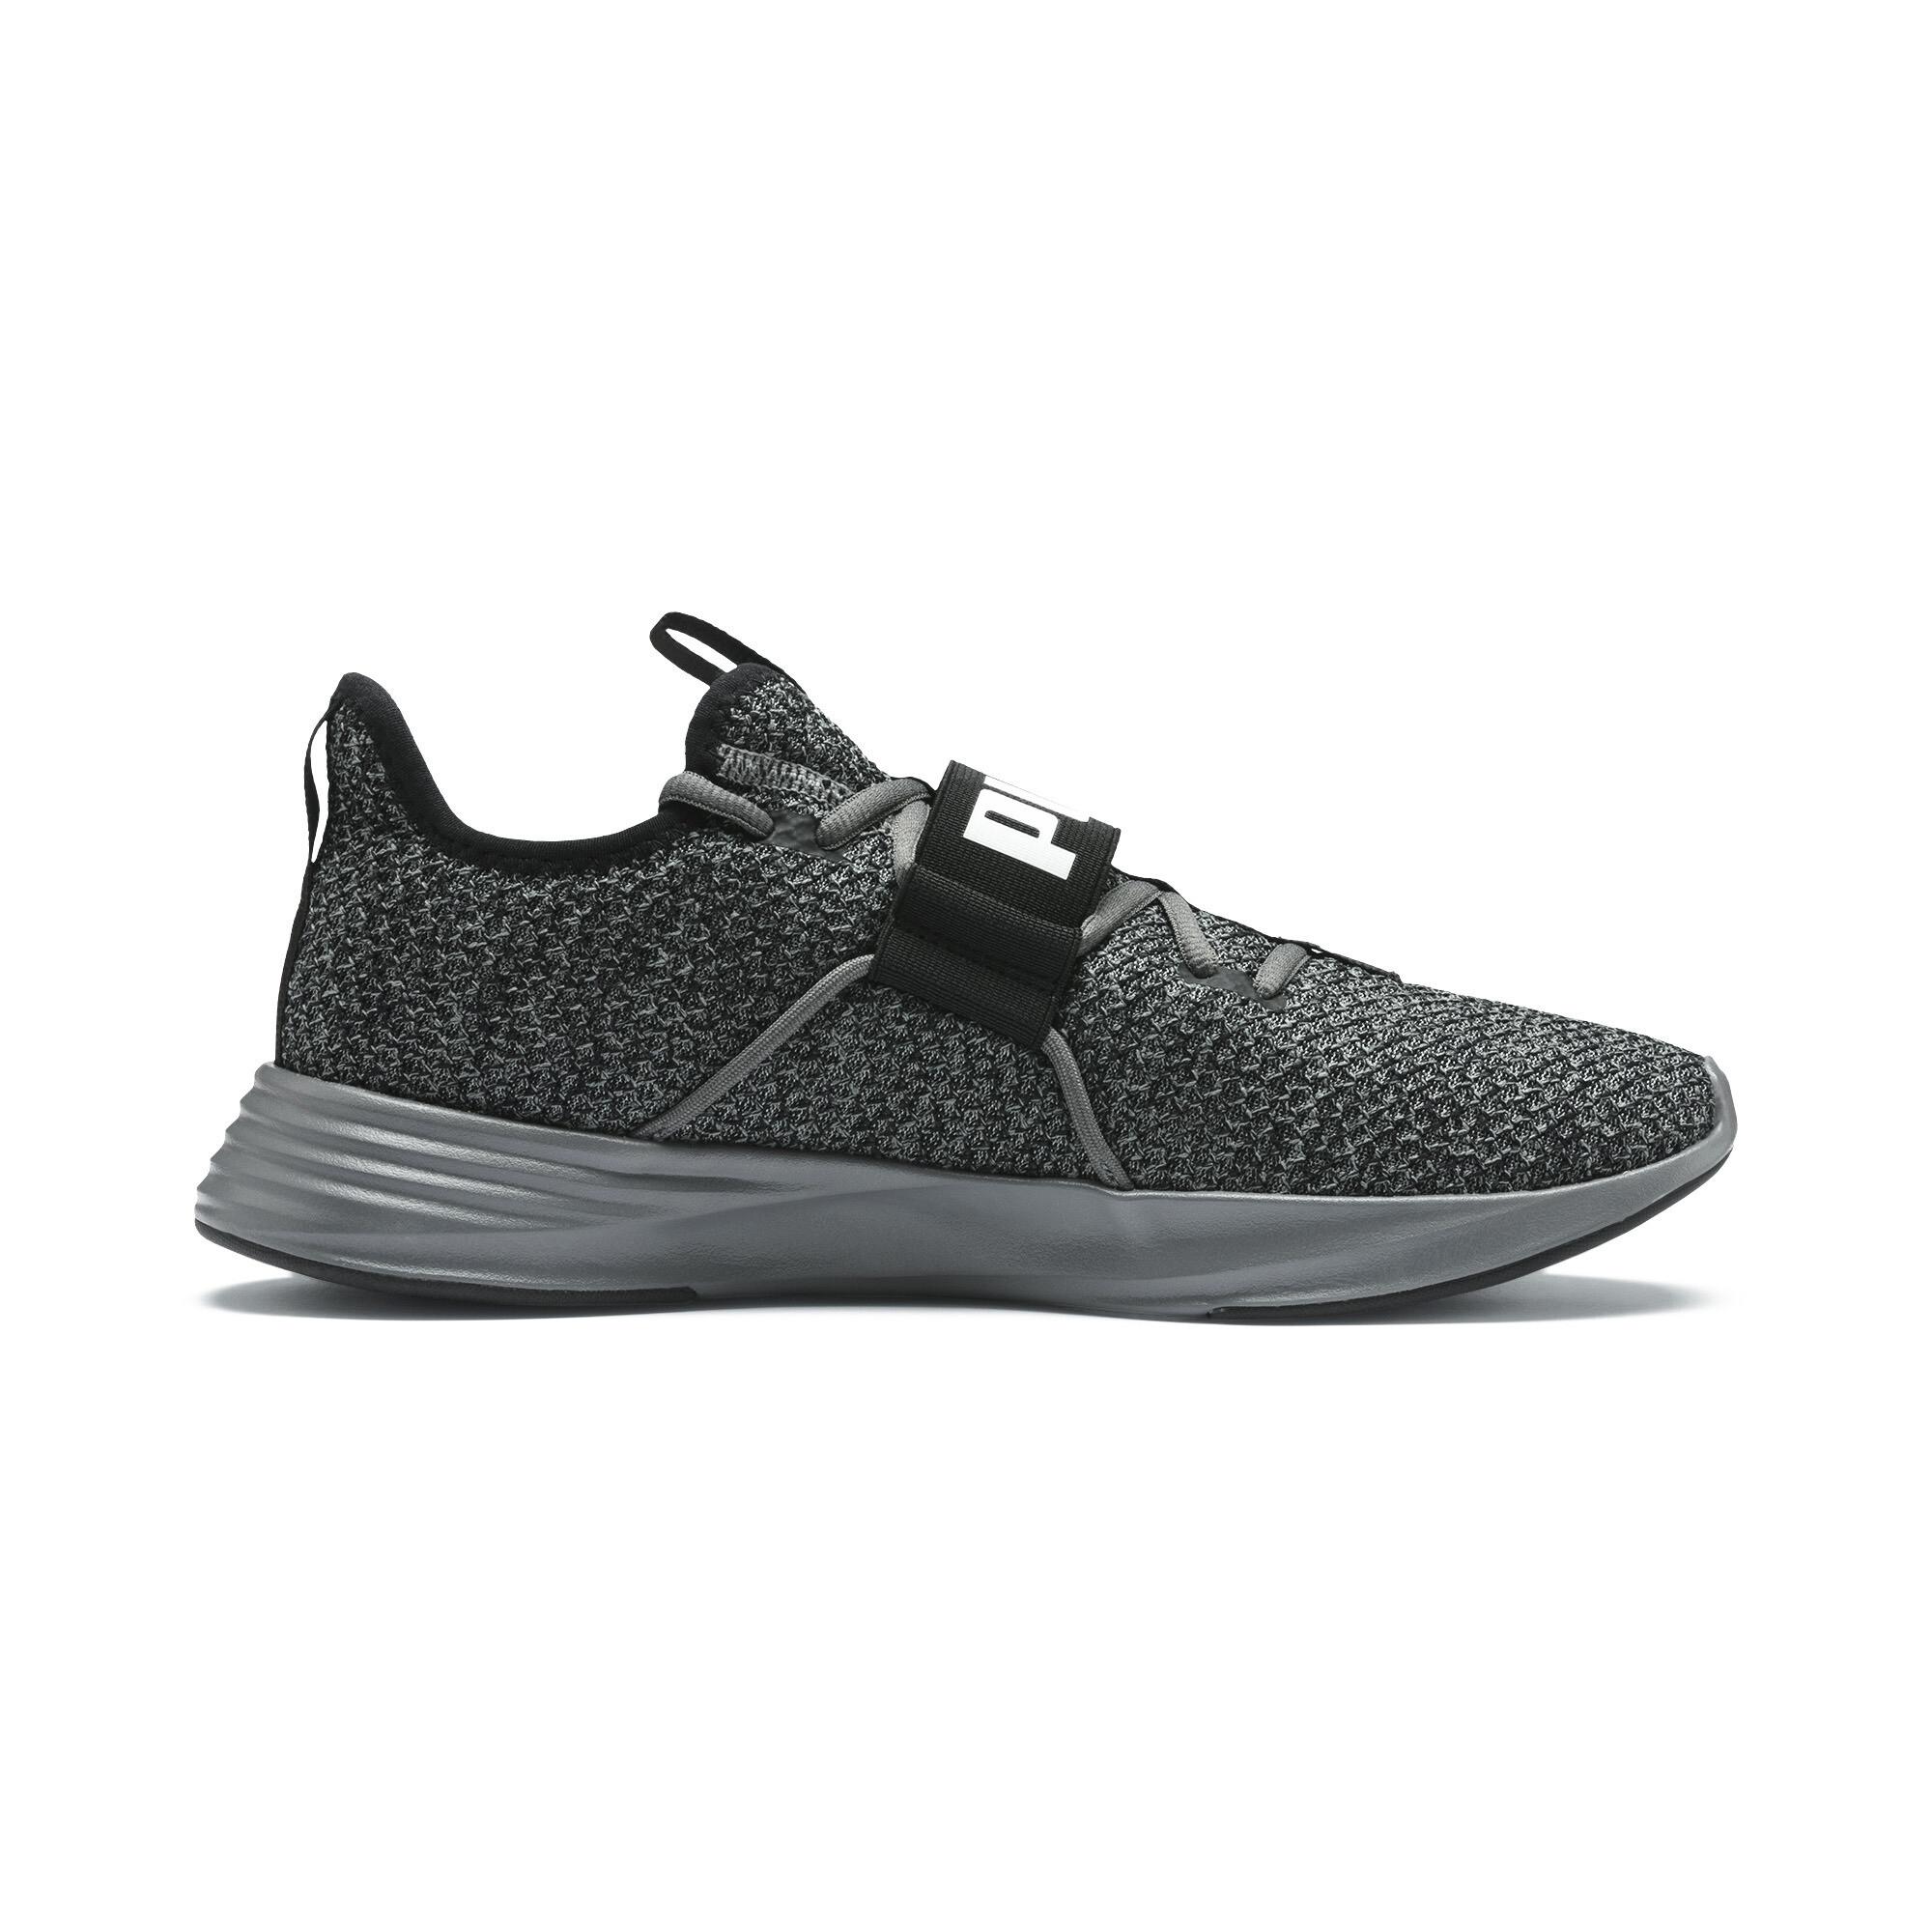 PUMA-Men-039-s-Persist-XT-Knit-Training-Shoes thumbnail 14